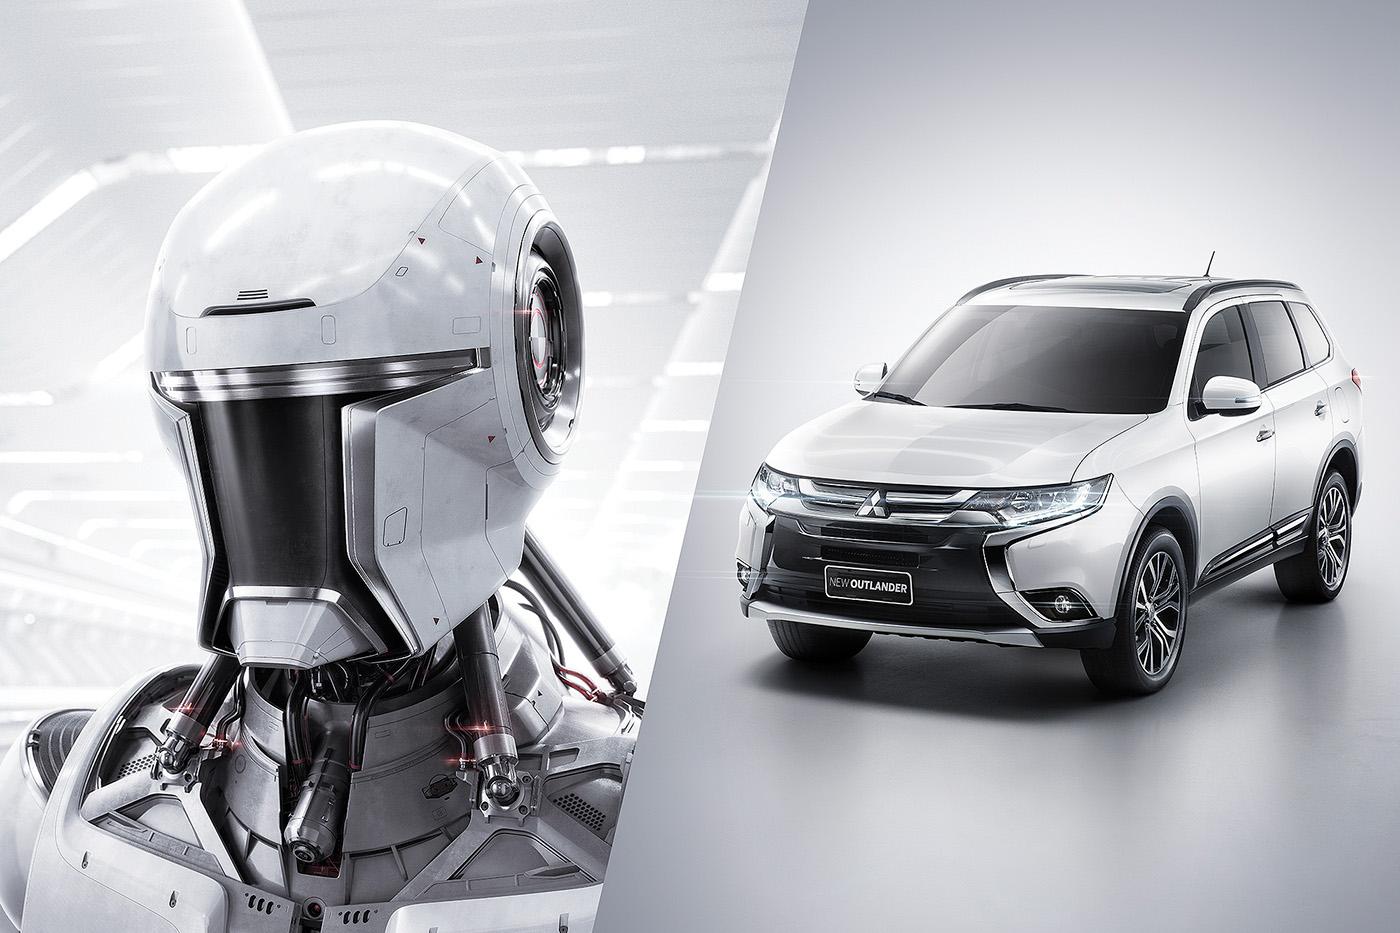 Mitsubishi car robot clean future White